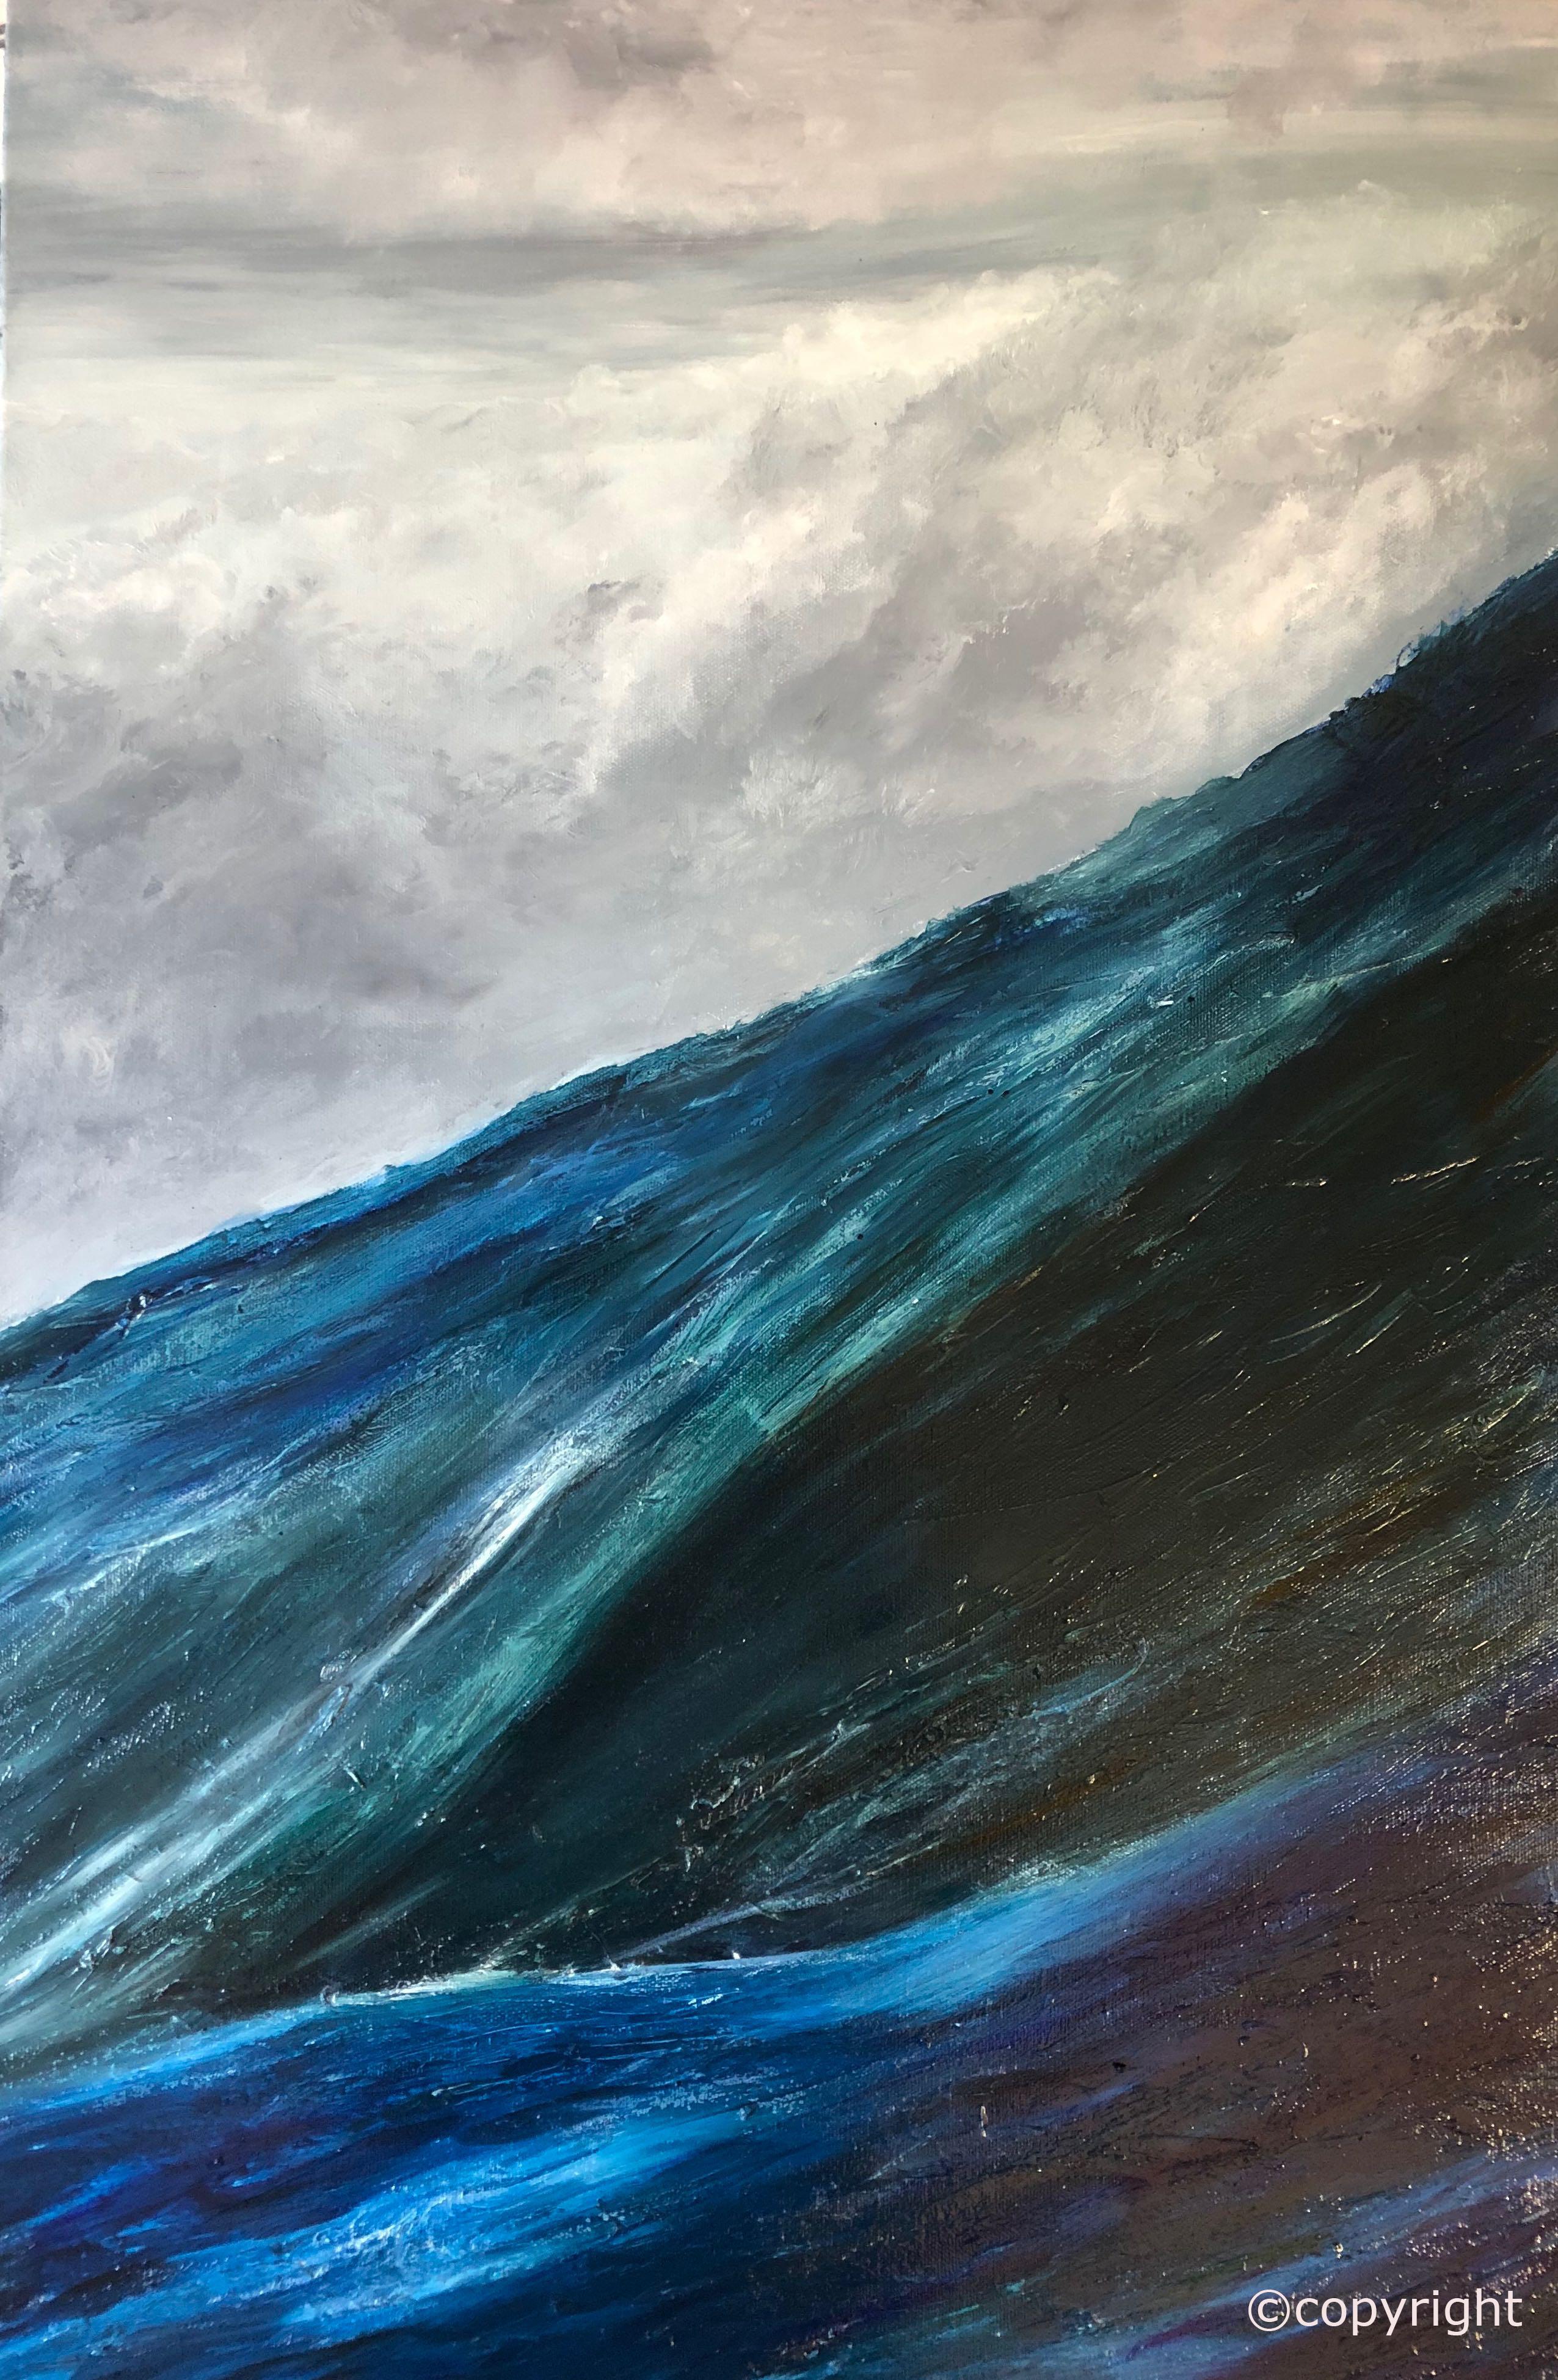 Stormy seas stage 3